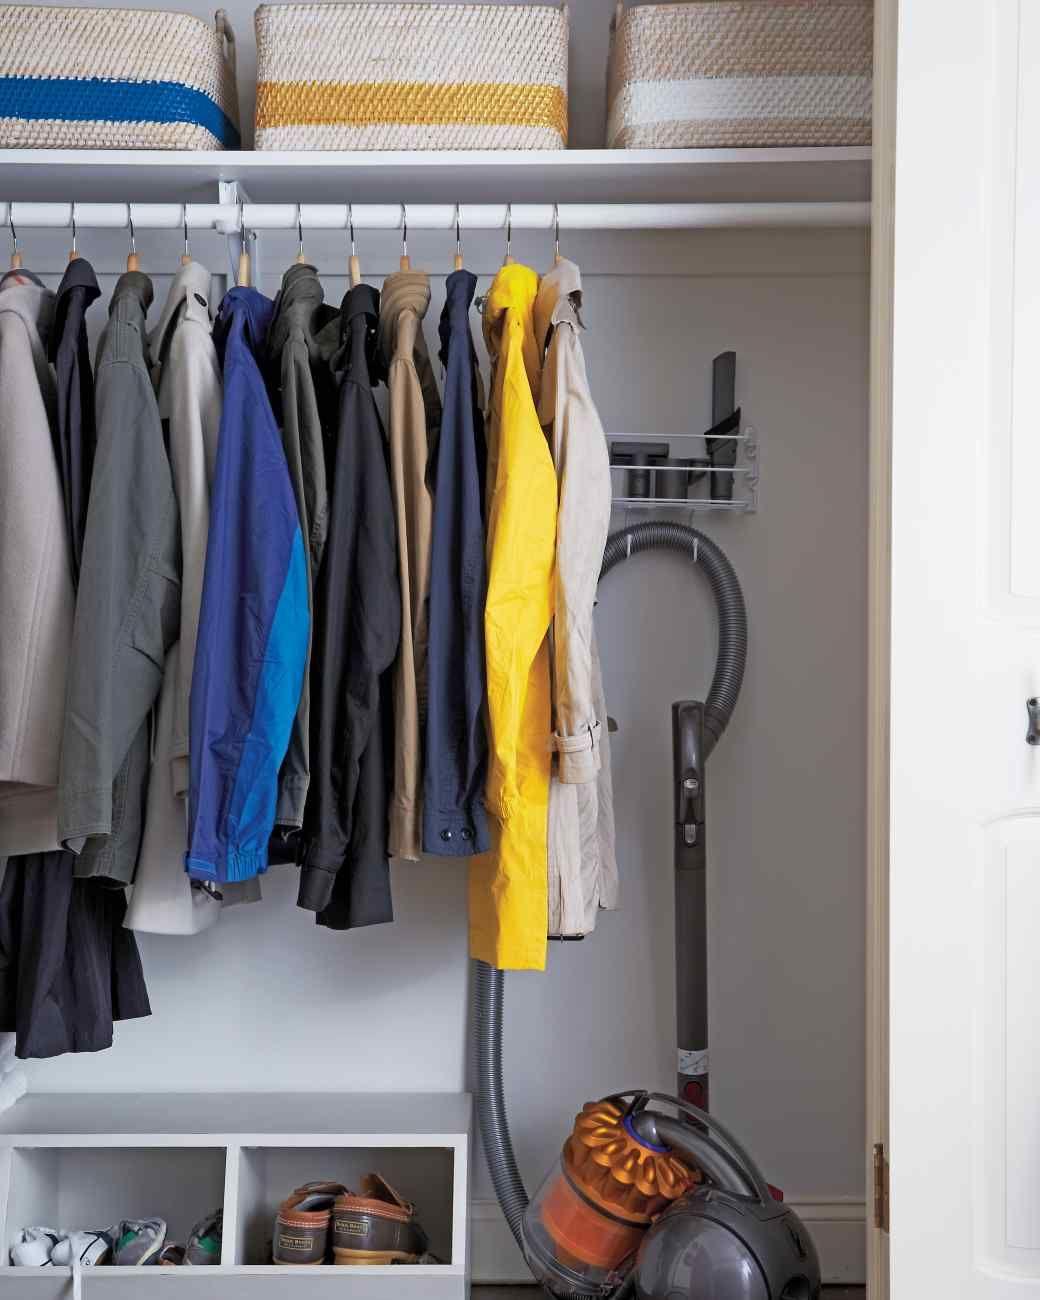 How To Declutter Your Coat Closet Like A Professional Coat Closet Organization Coat Closet Storage Closet Organization